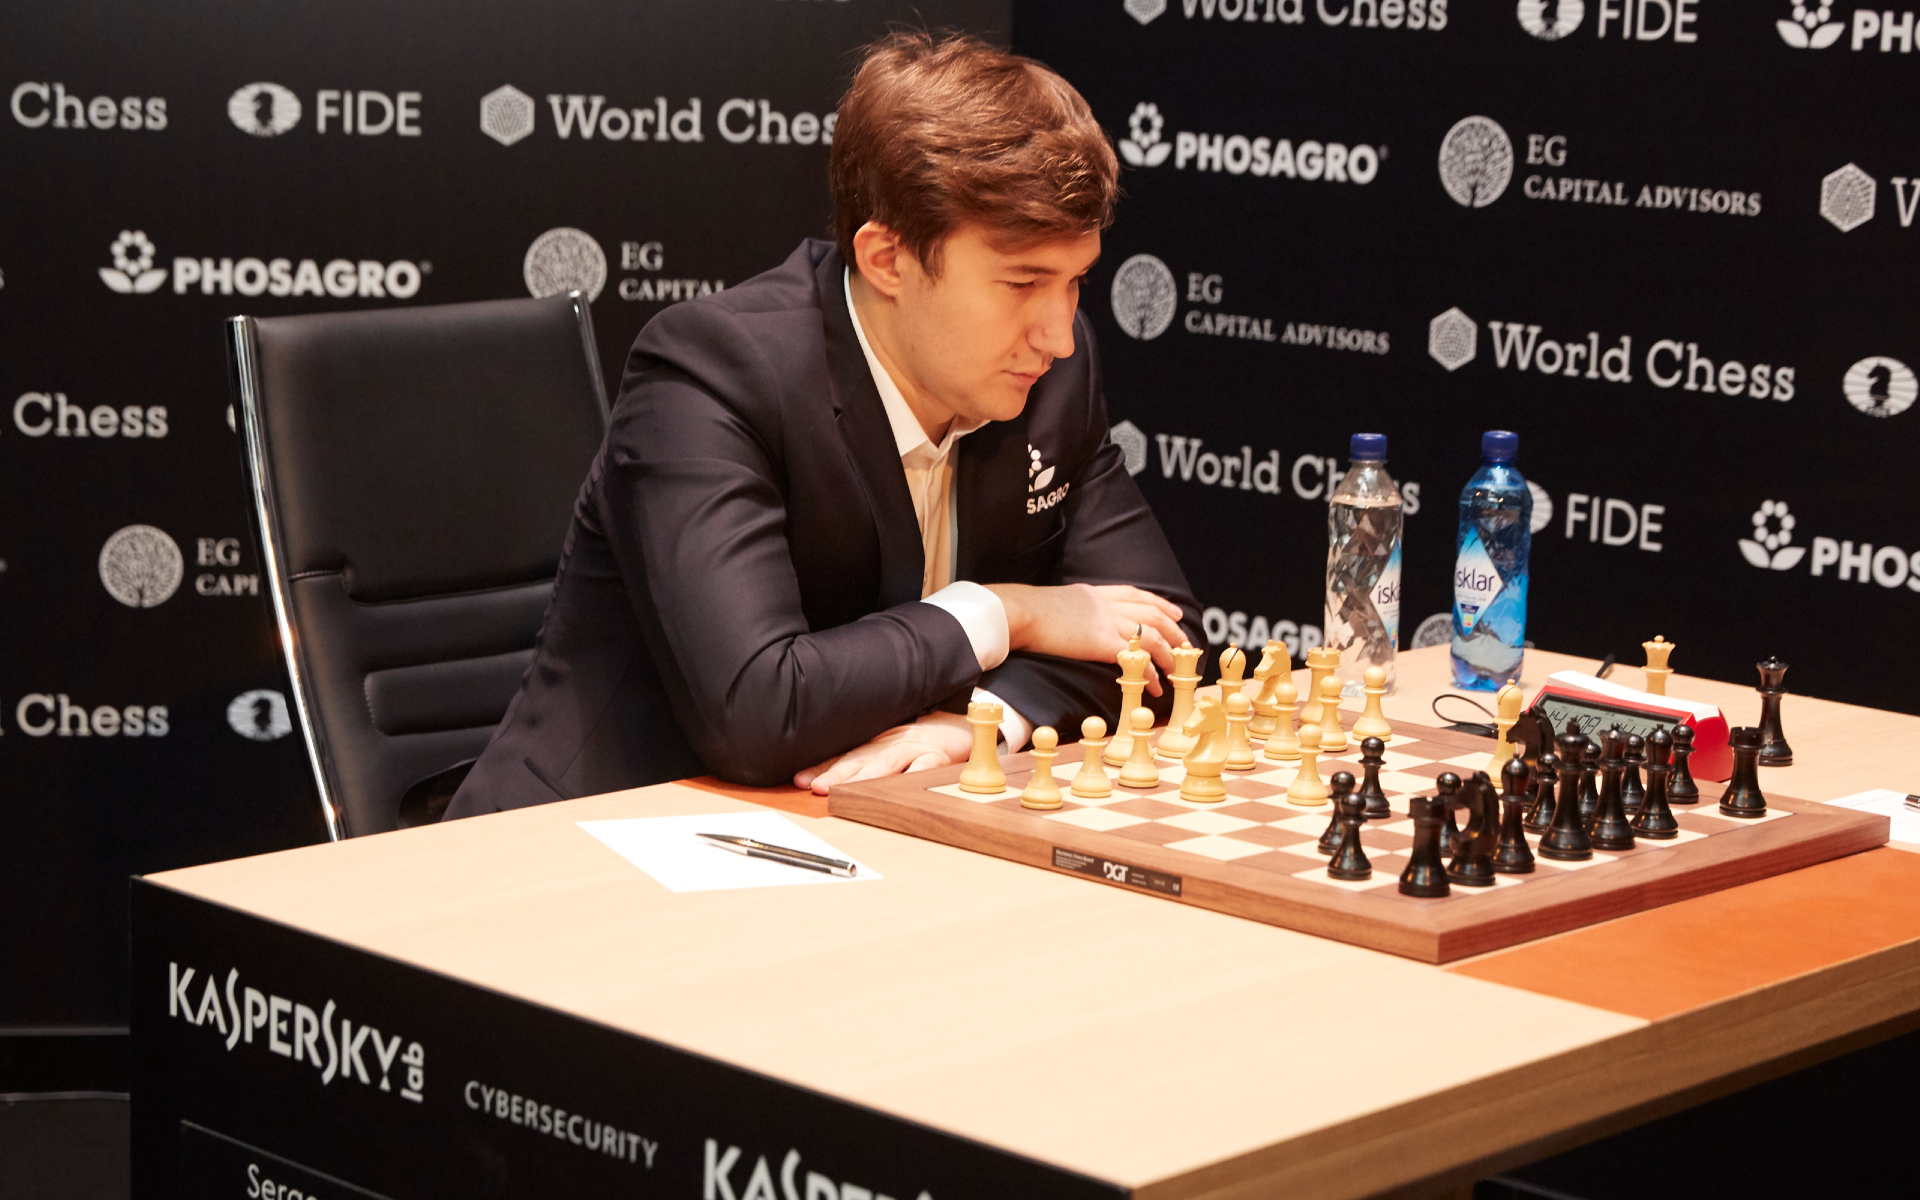 Фото: Сергей Карякин (Sebastian Reuter/Getty Images for World Chess)